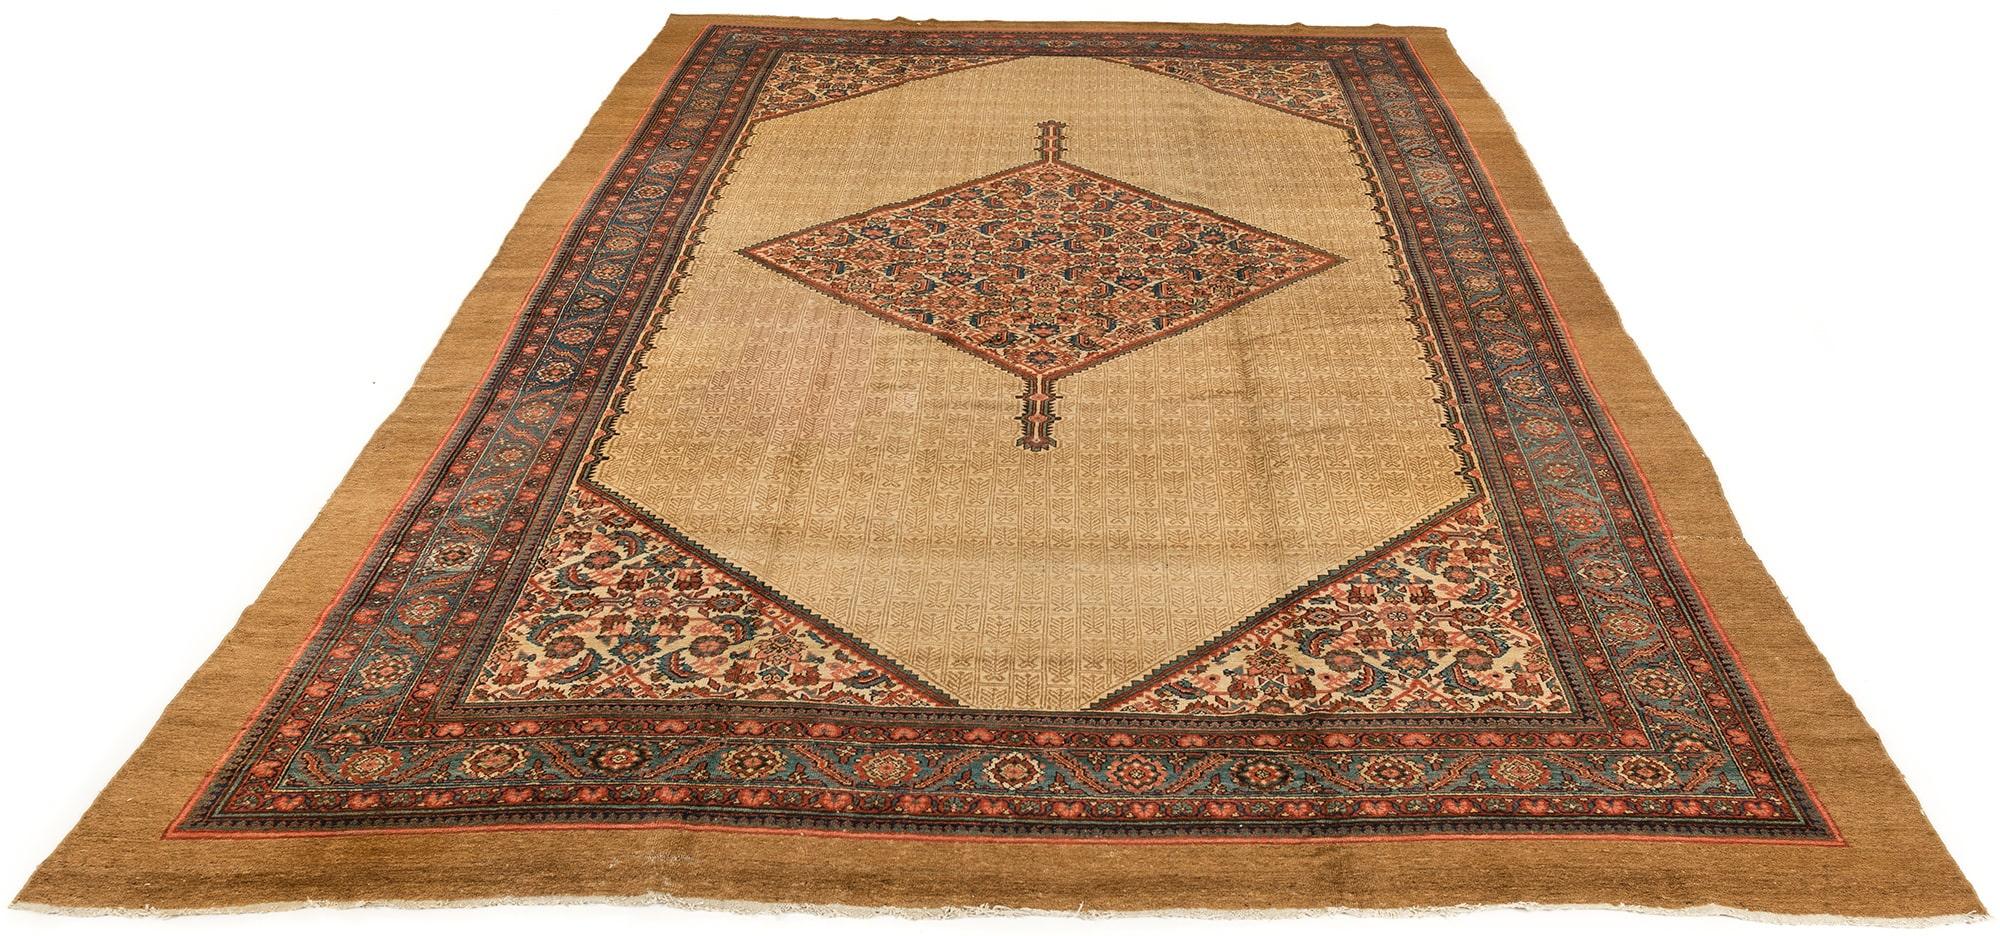 Antique Persian Camel Hair Serab 10 6